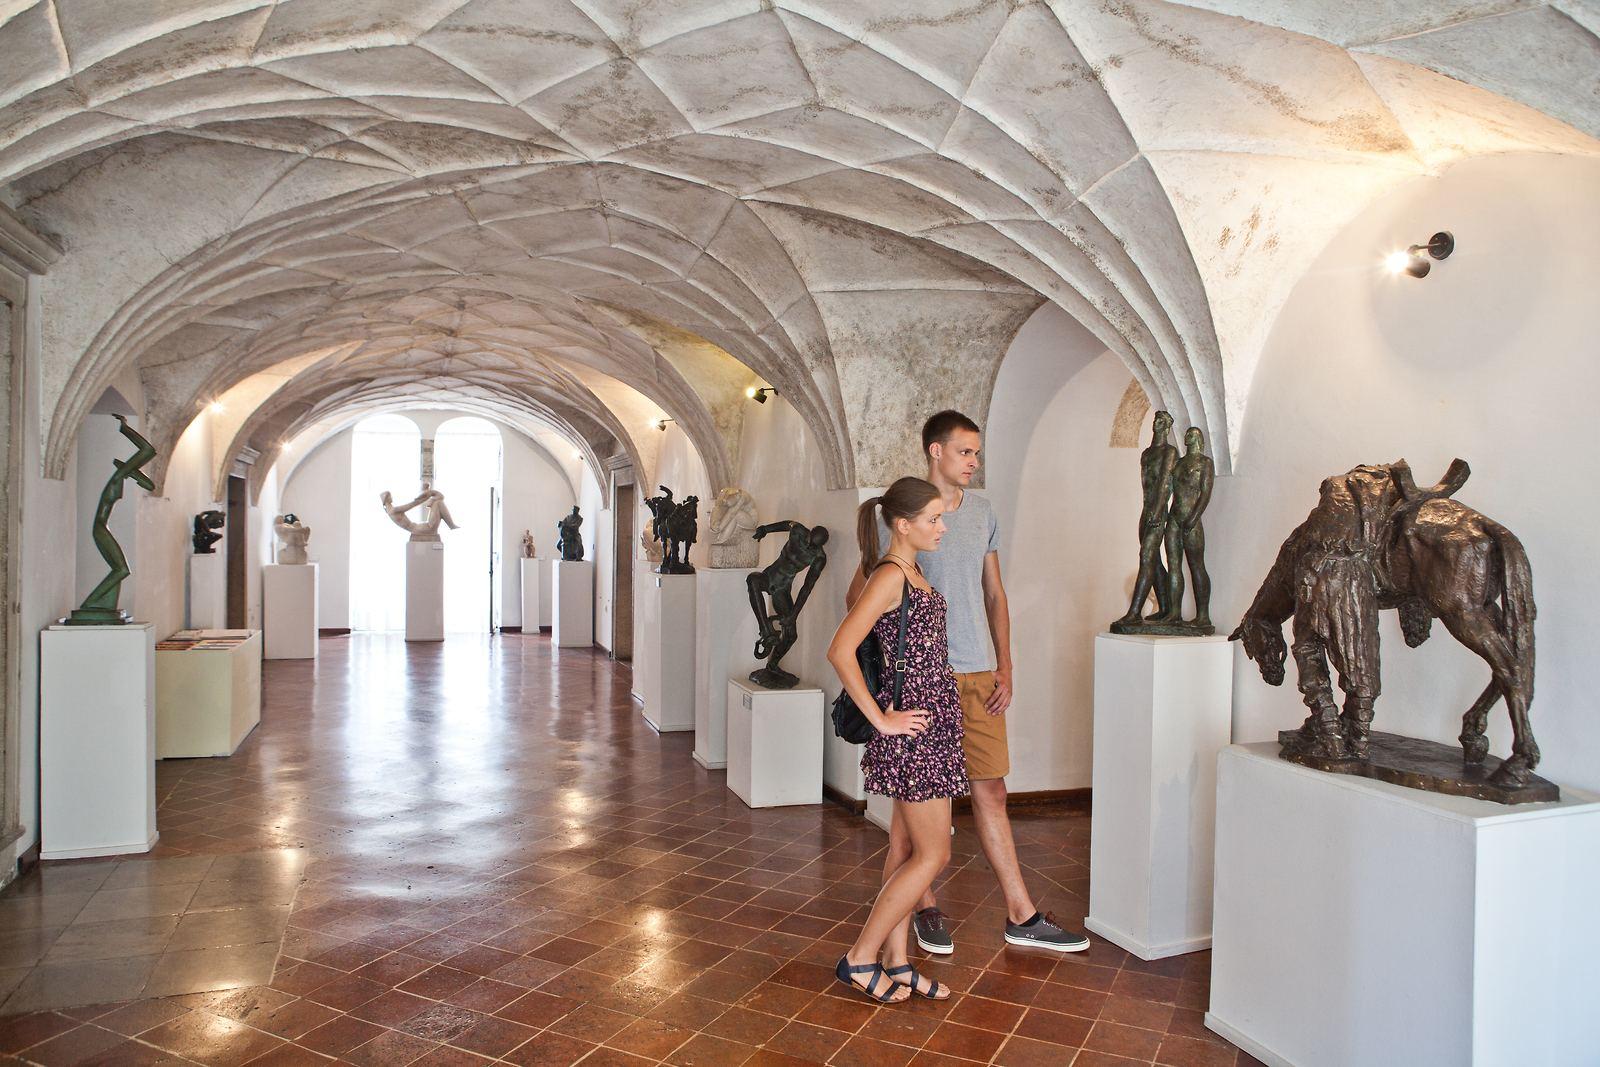 Regionální muzeum Gorenjska, Kranj, Slovinsko. Foto: Jošt Gantar